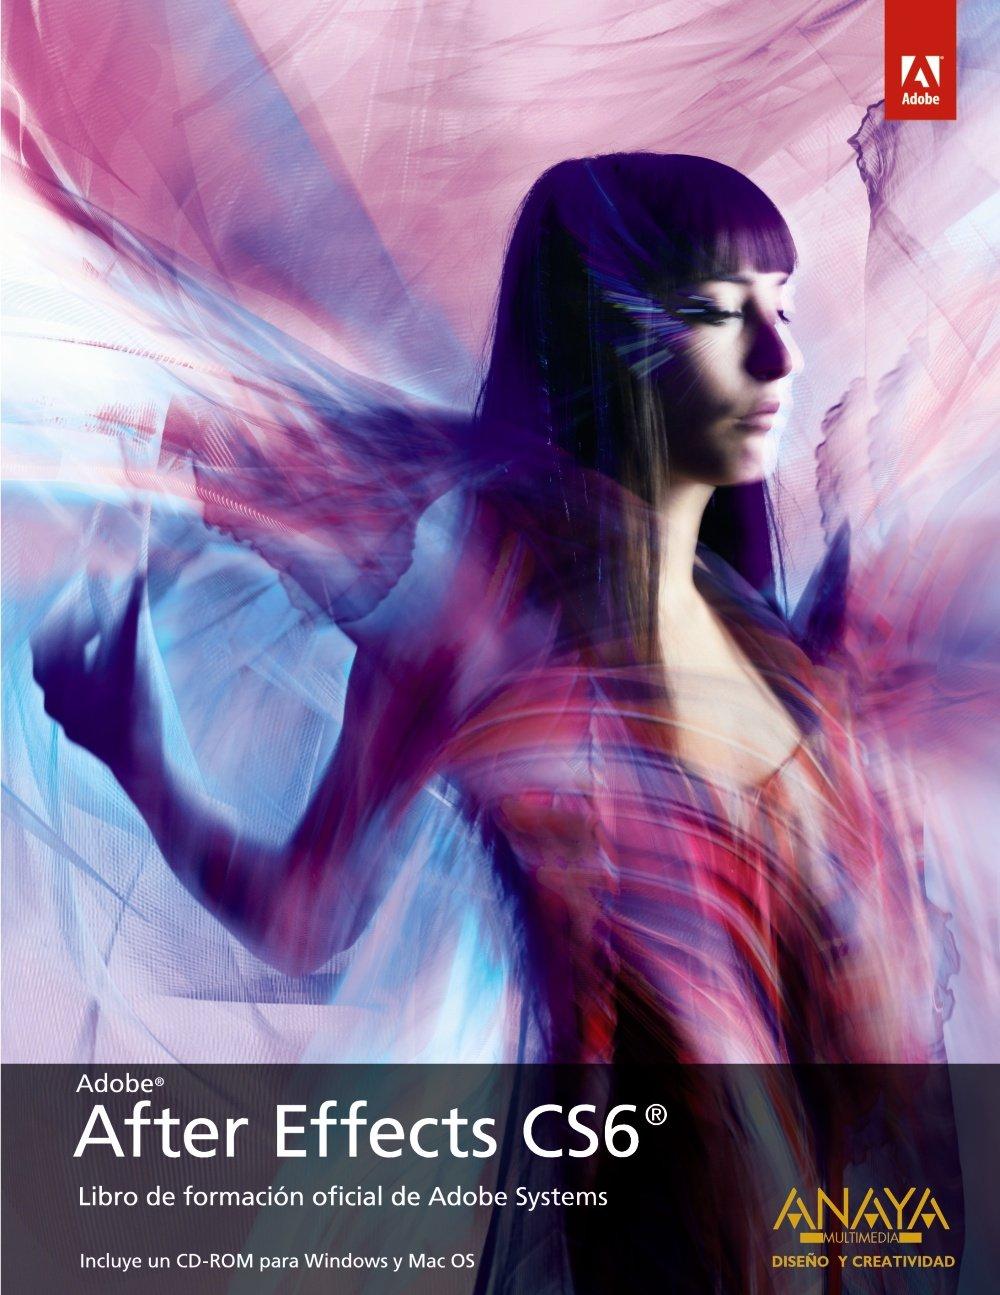 After Effects Cs6 Medios Digitales Y Creatividad Spanish Edition Adobe Press 9788441532571 Amazon Com Books